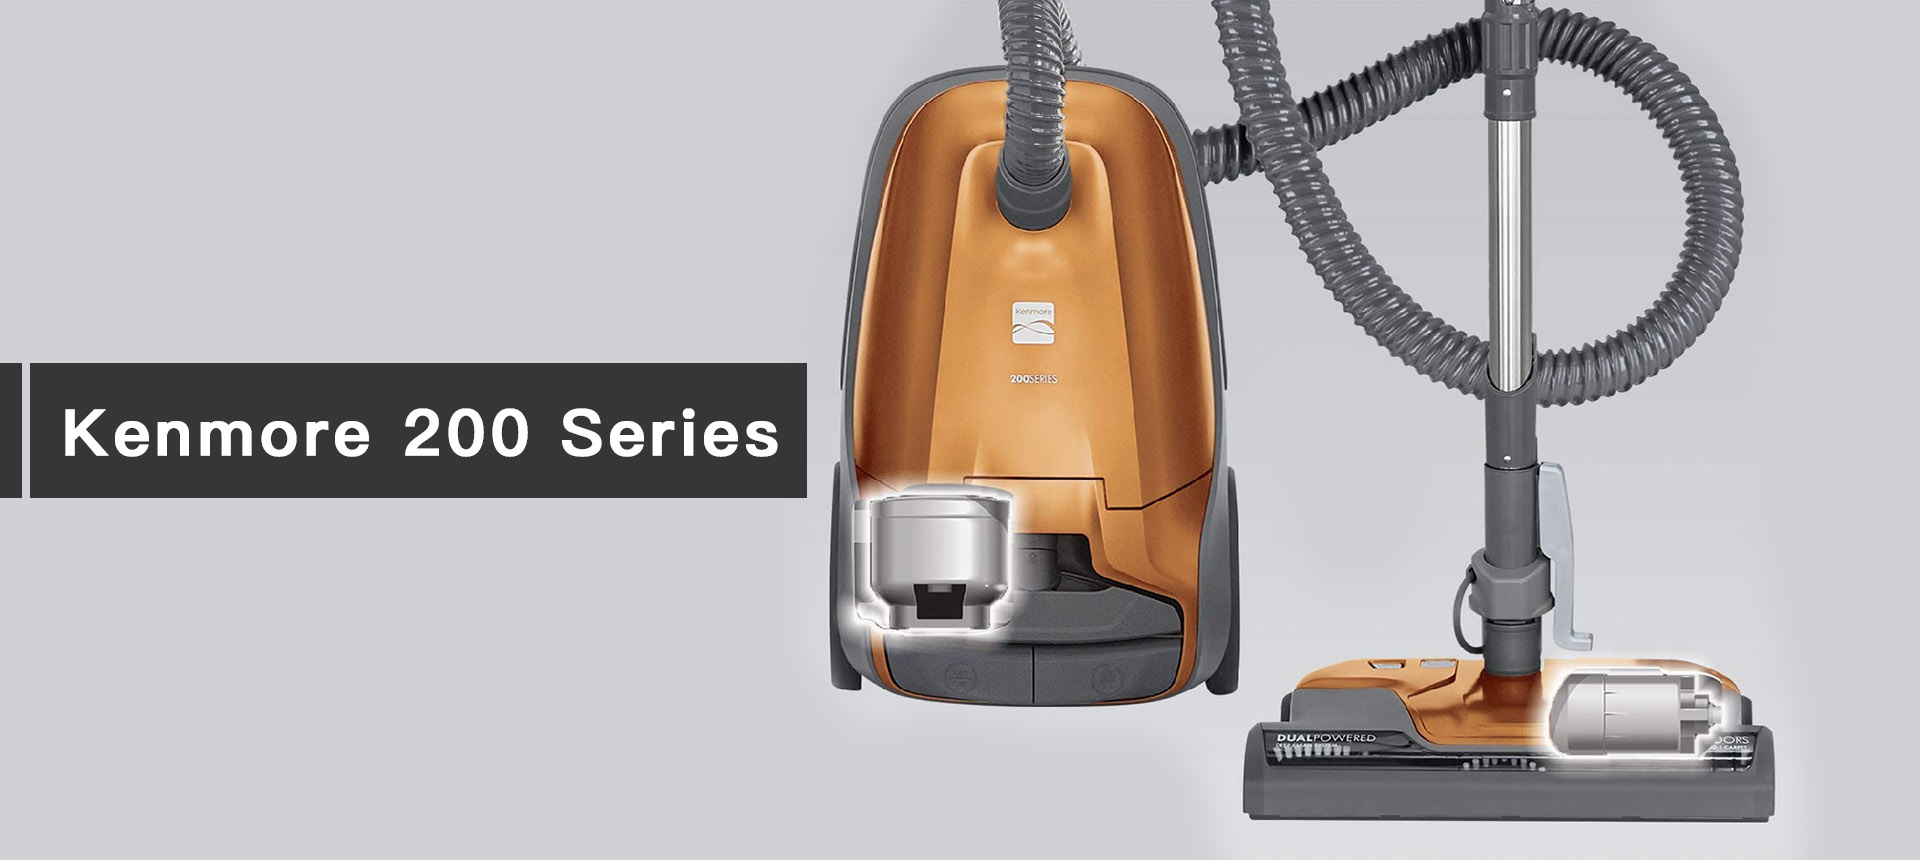 Kenmore 200 Series vacuum